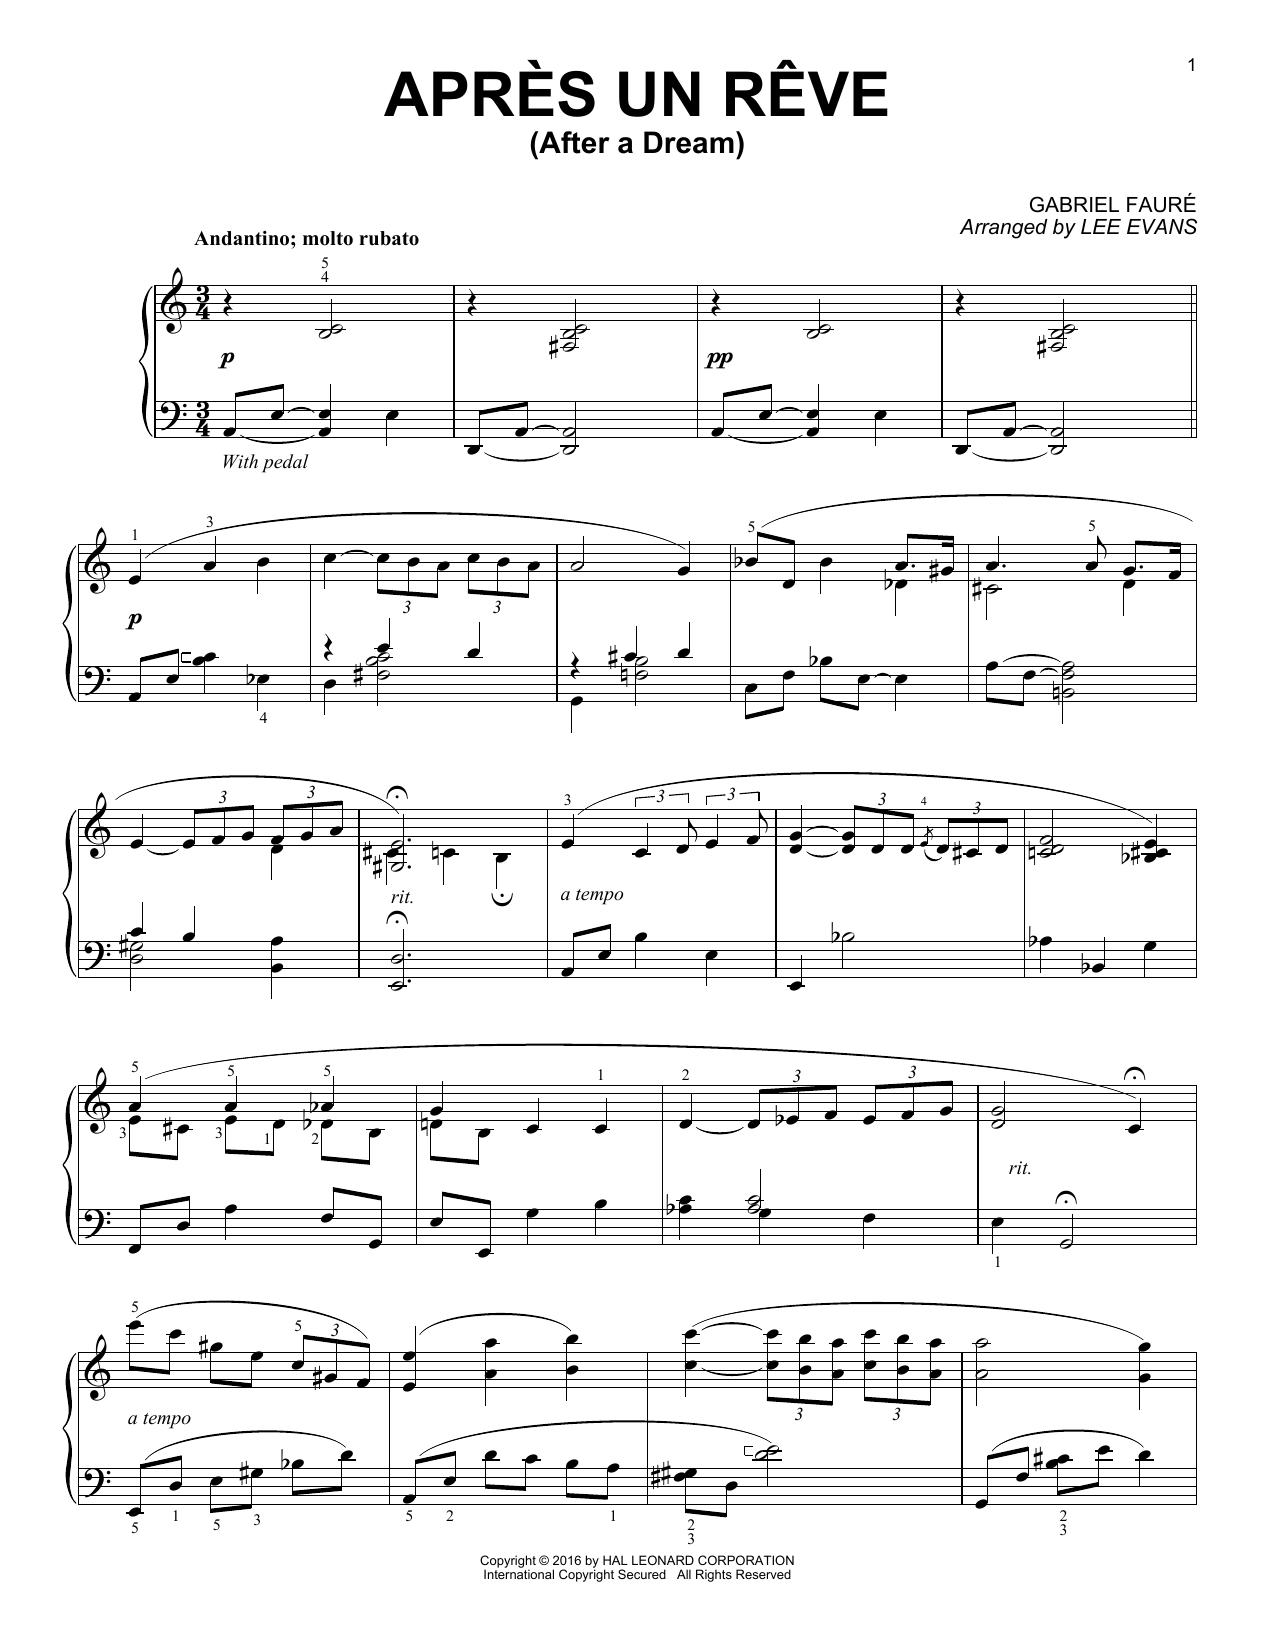 Lee Evans Apres un reve sheet music notes and chords. Download Printable PDF.